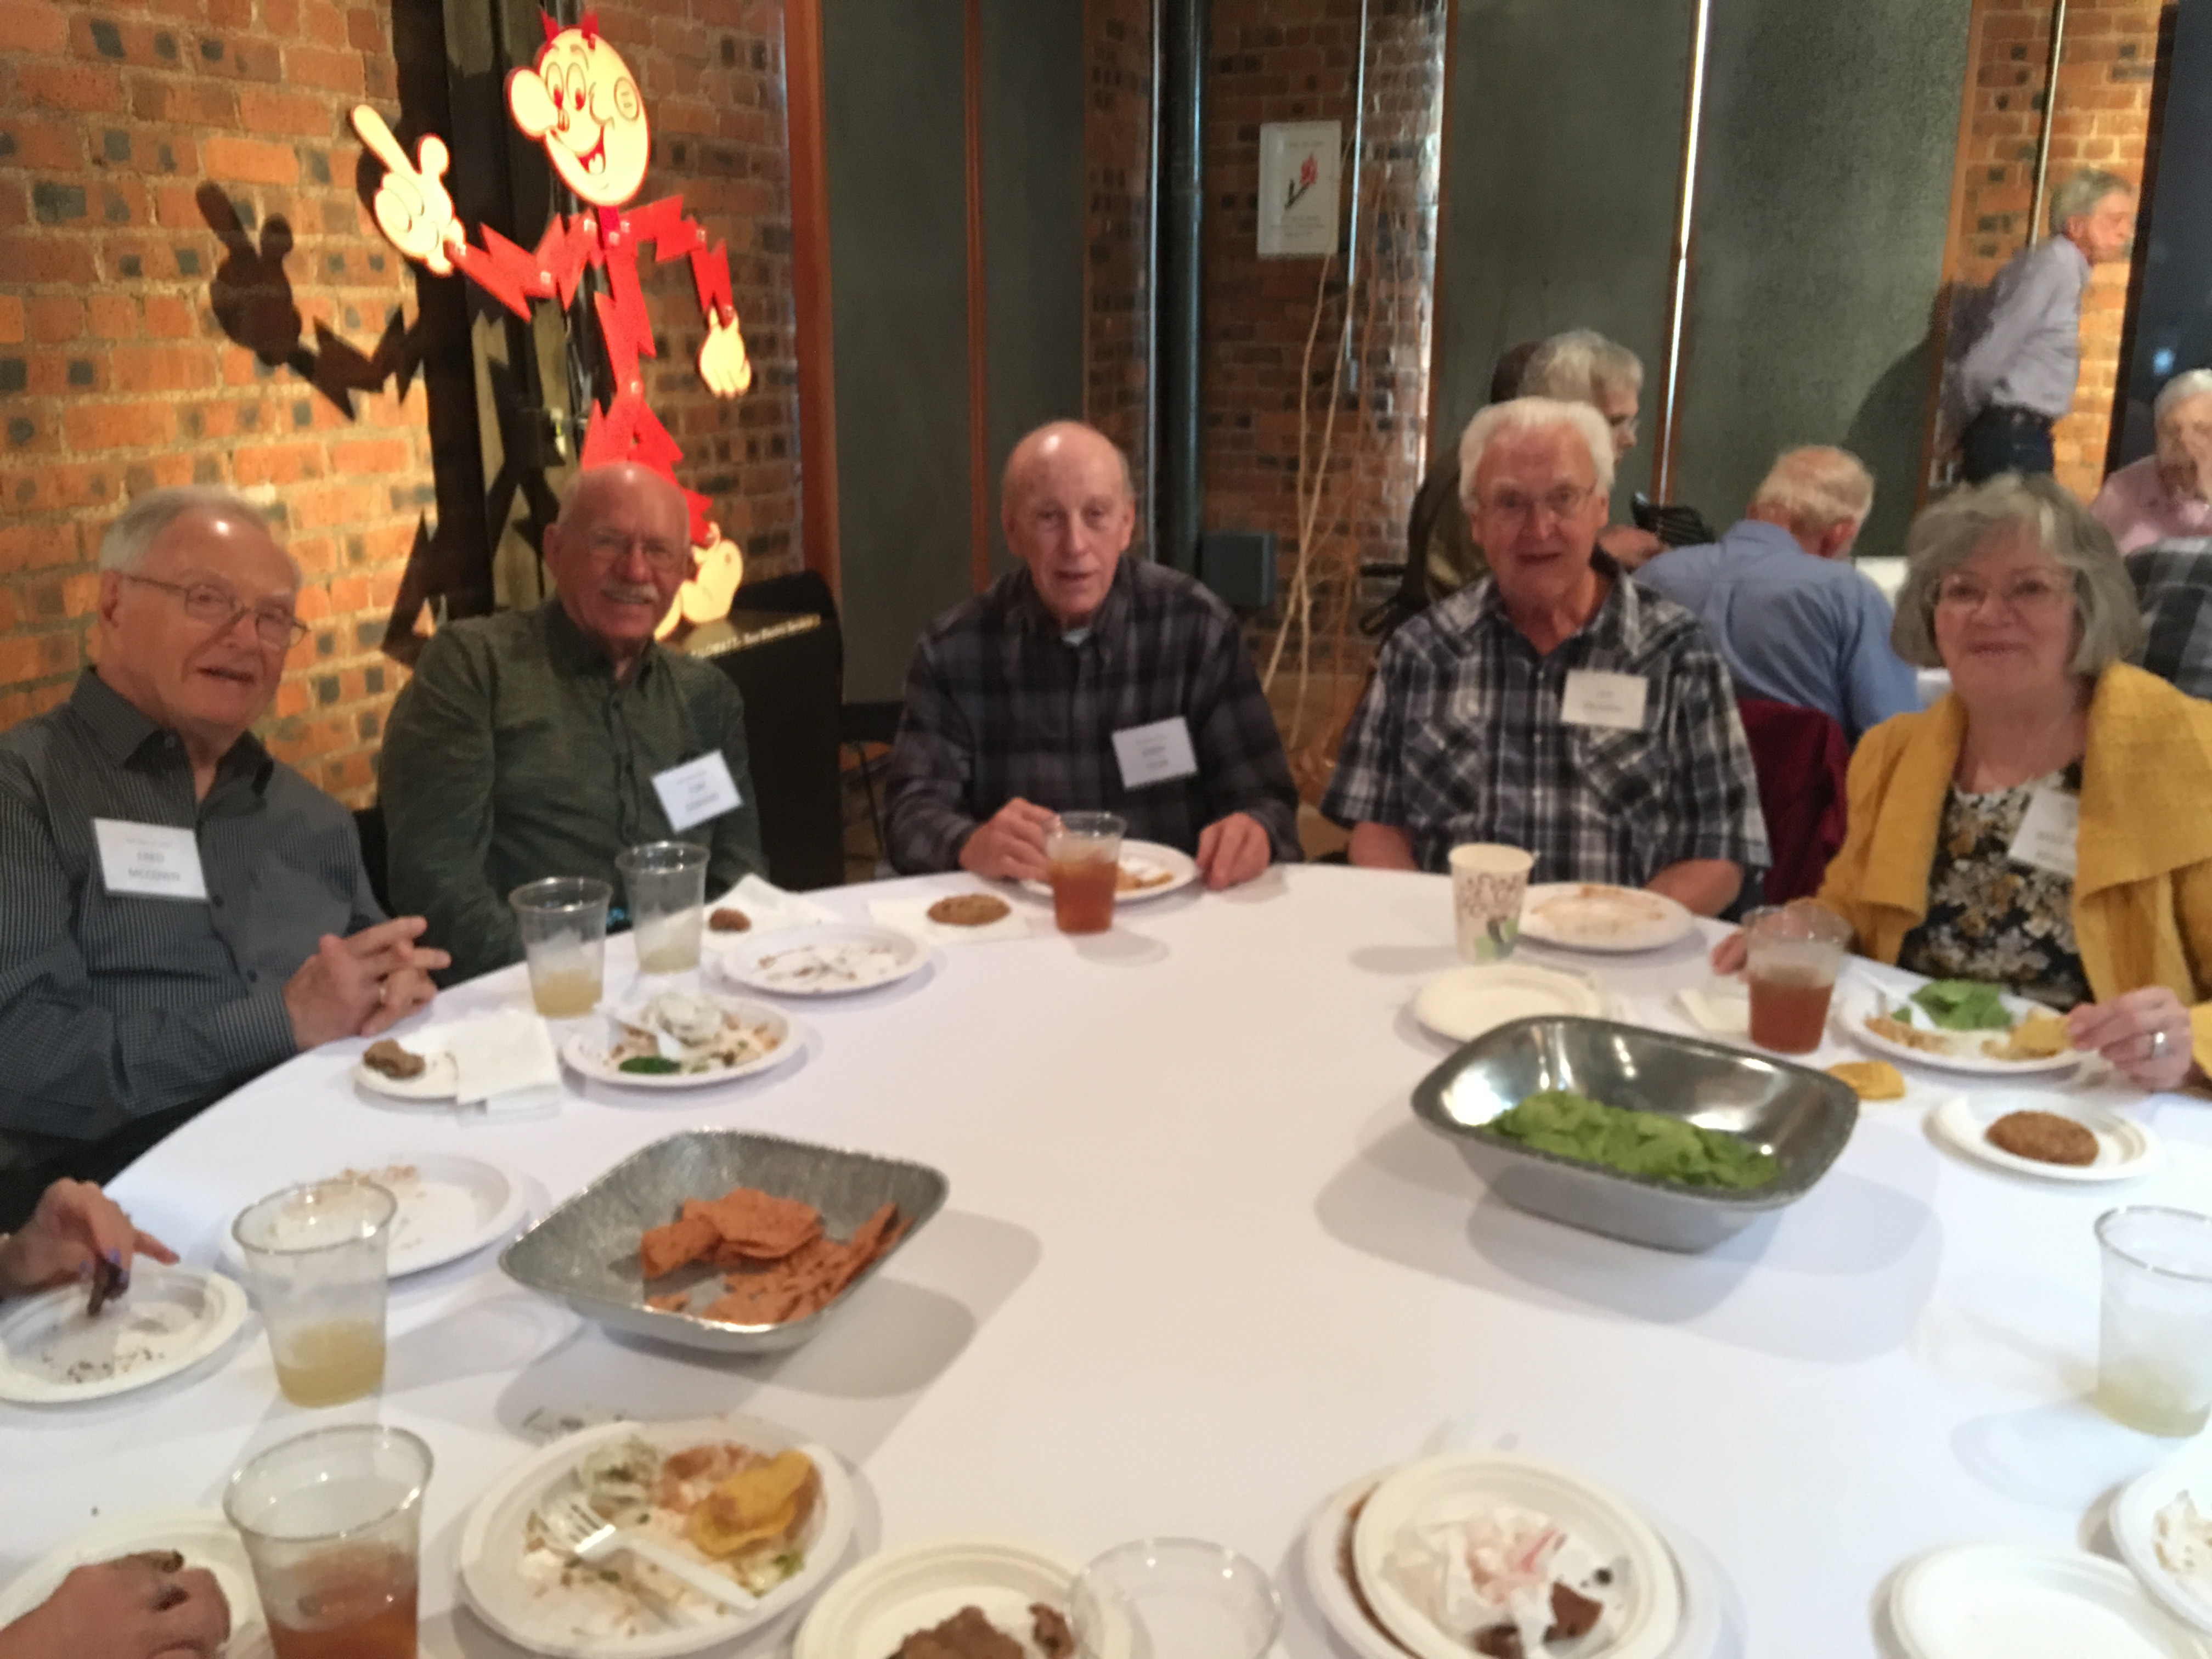 Fred McCown, Tom Gebhard, Bobby Tyler, Leo Krukoski and Sue Woodward Krukoski